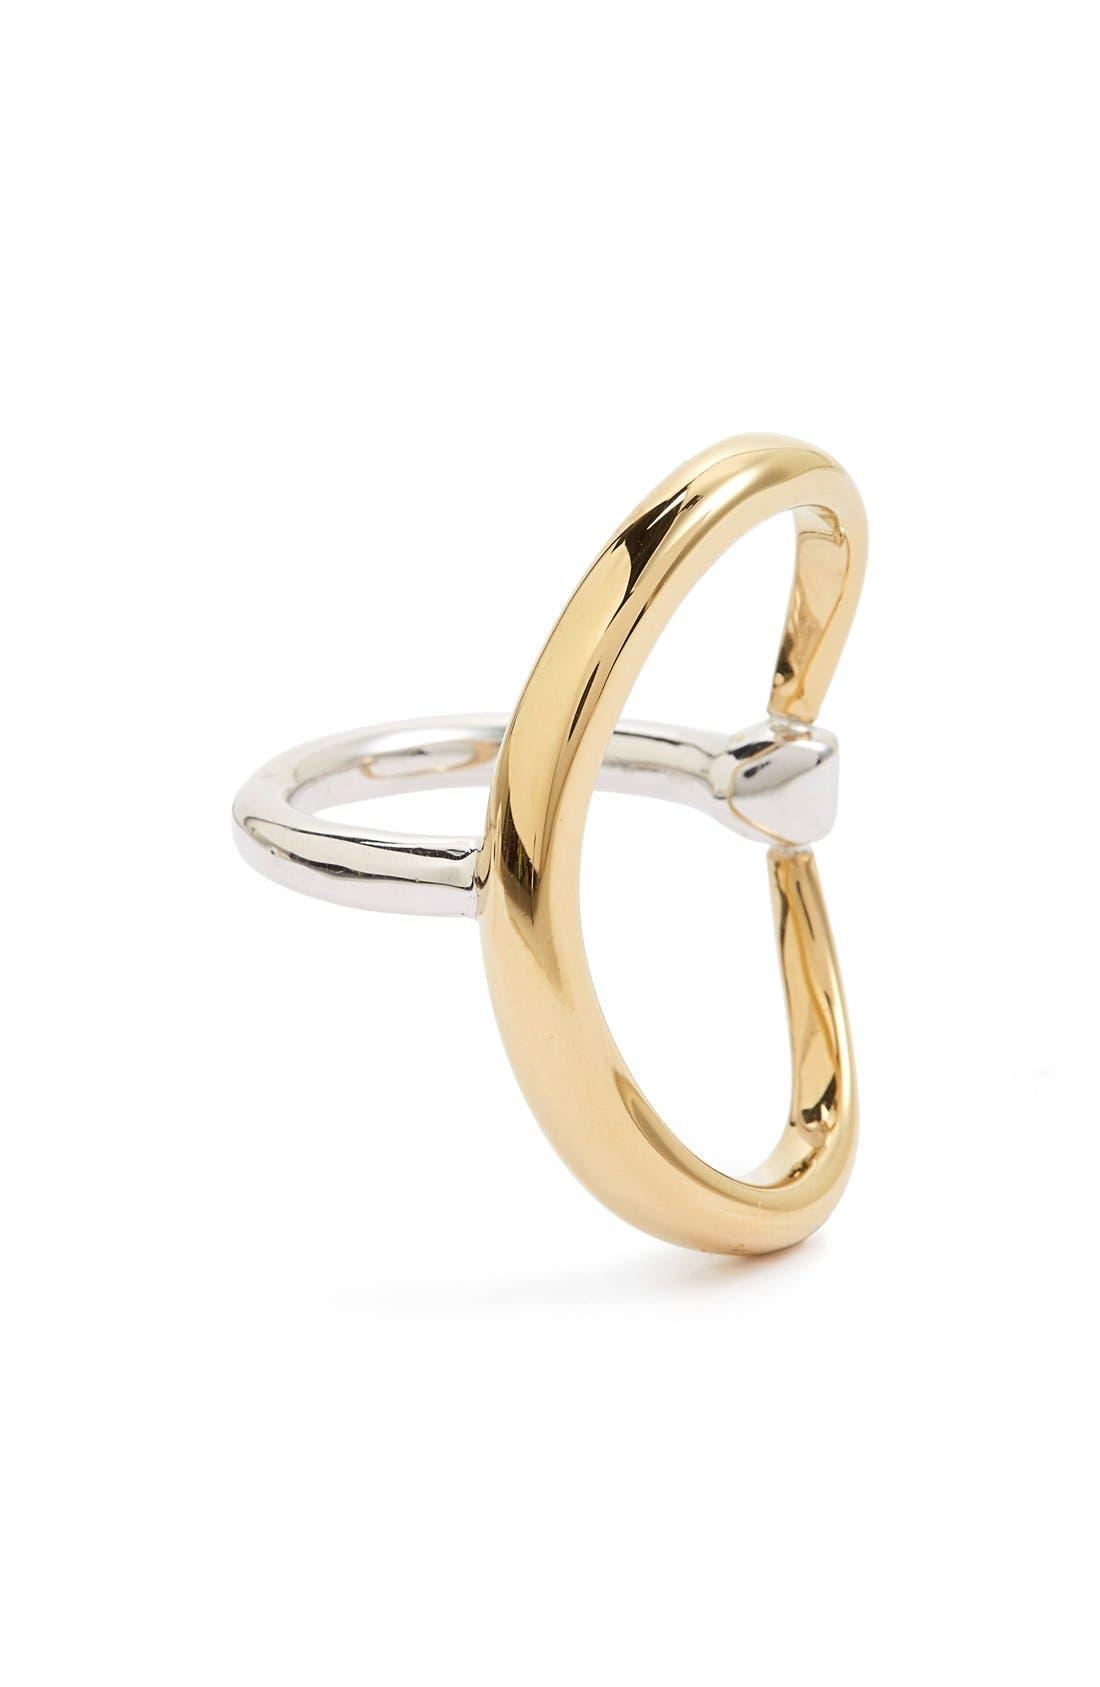 Turtle Ring,                         Main,                         color, VERMEIL/ SILVER